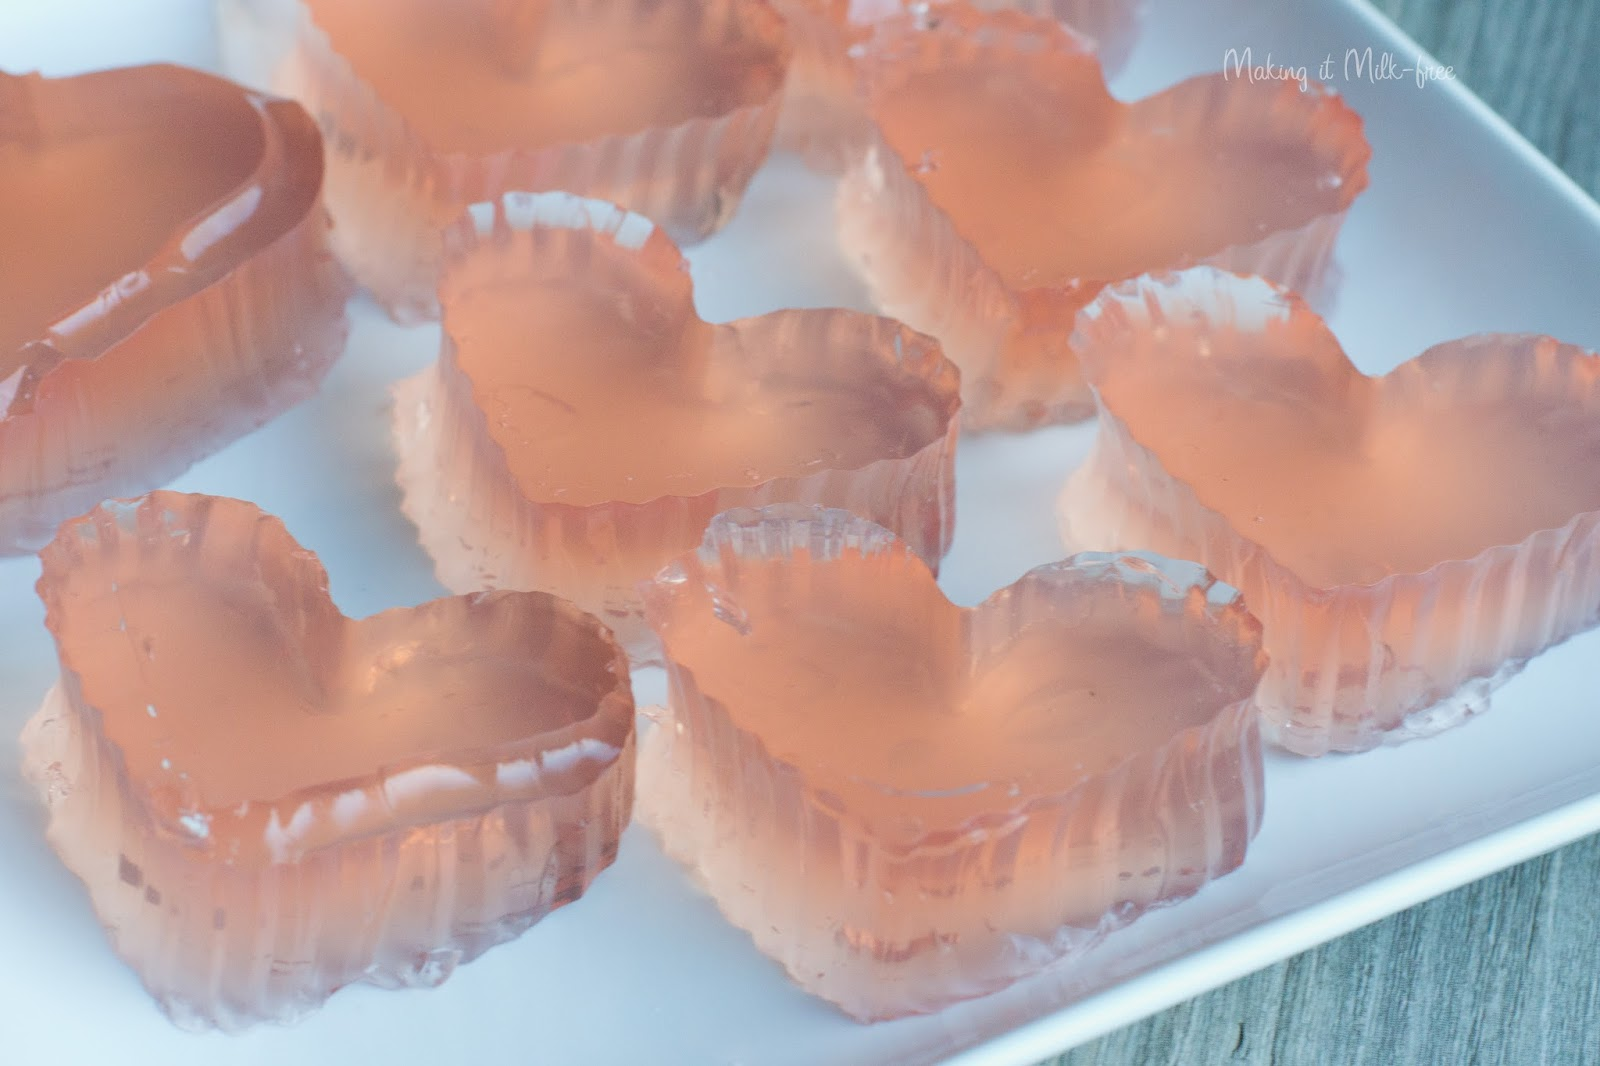 Berry Bubbly Gelatin Bites by Making it Milk-free